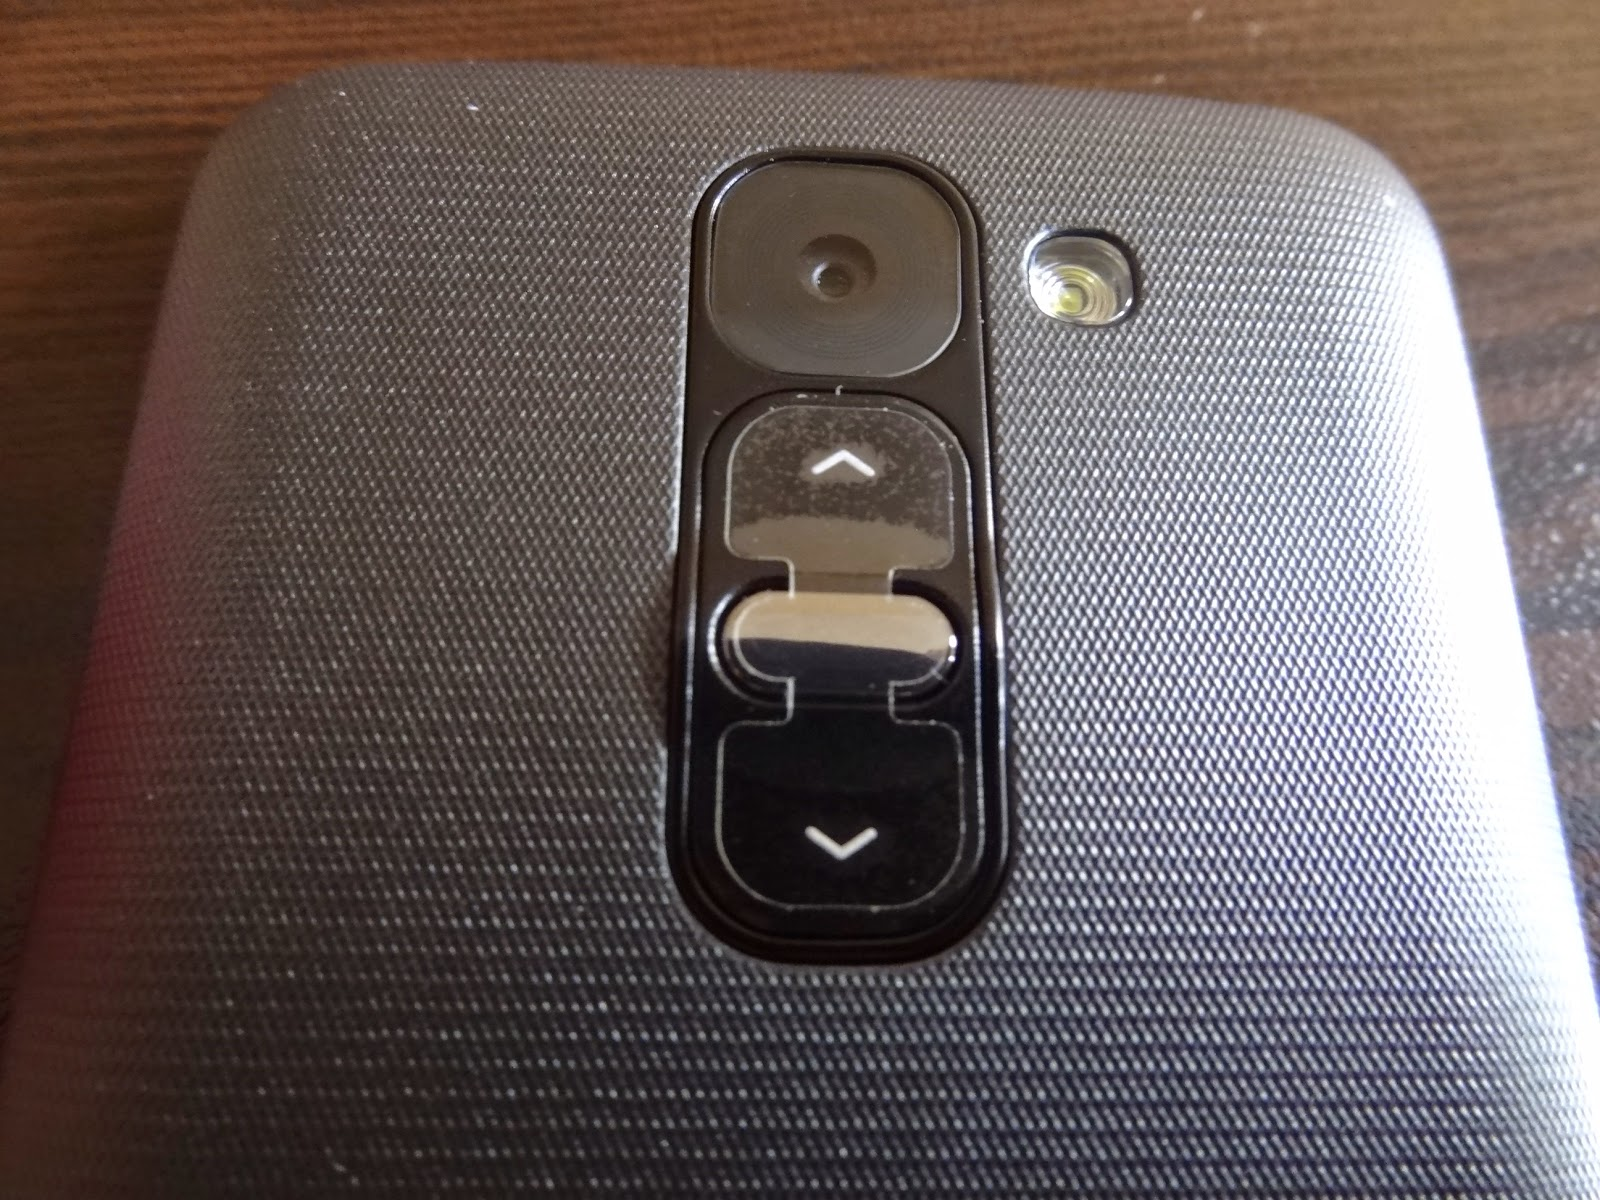 G2 mini 8 megapixel camera